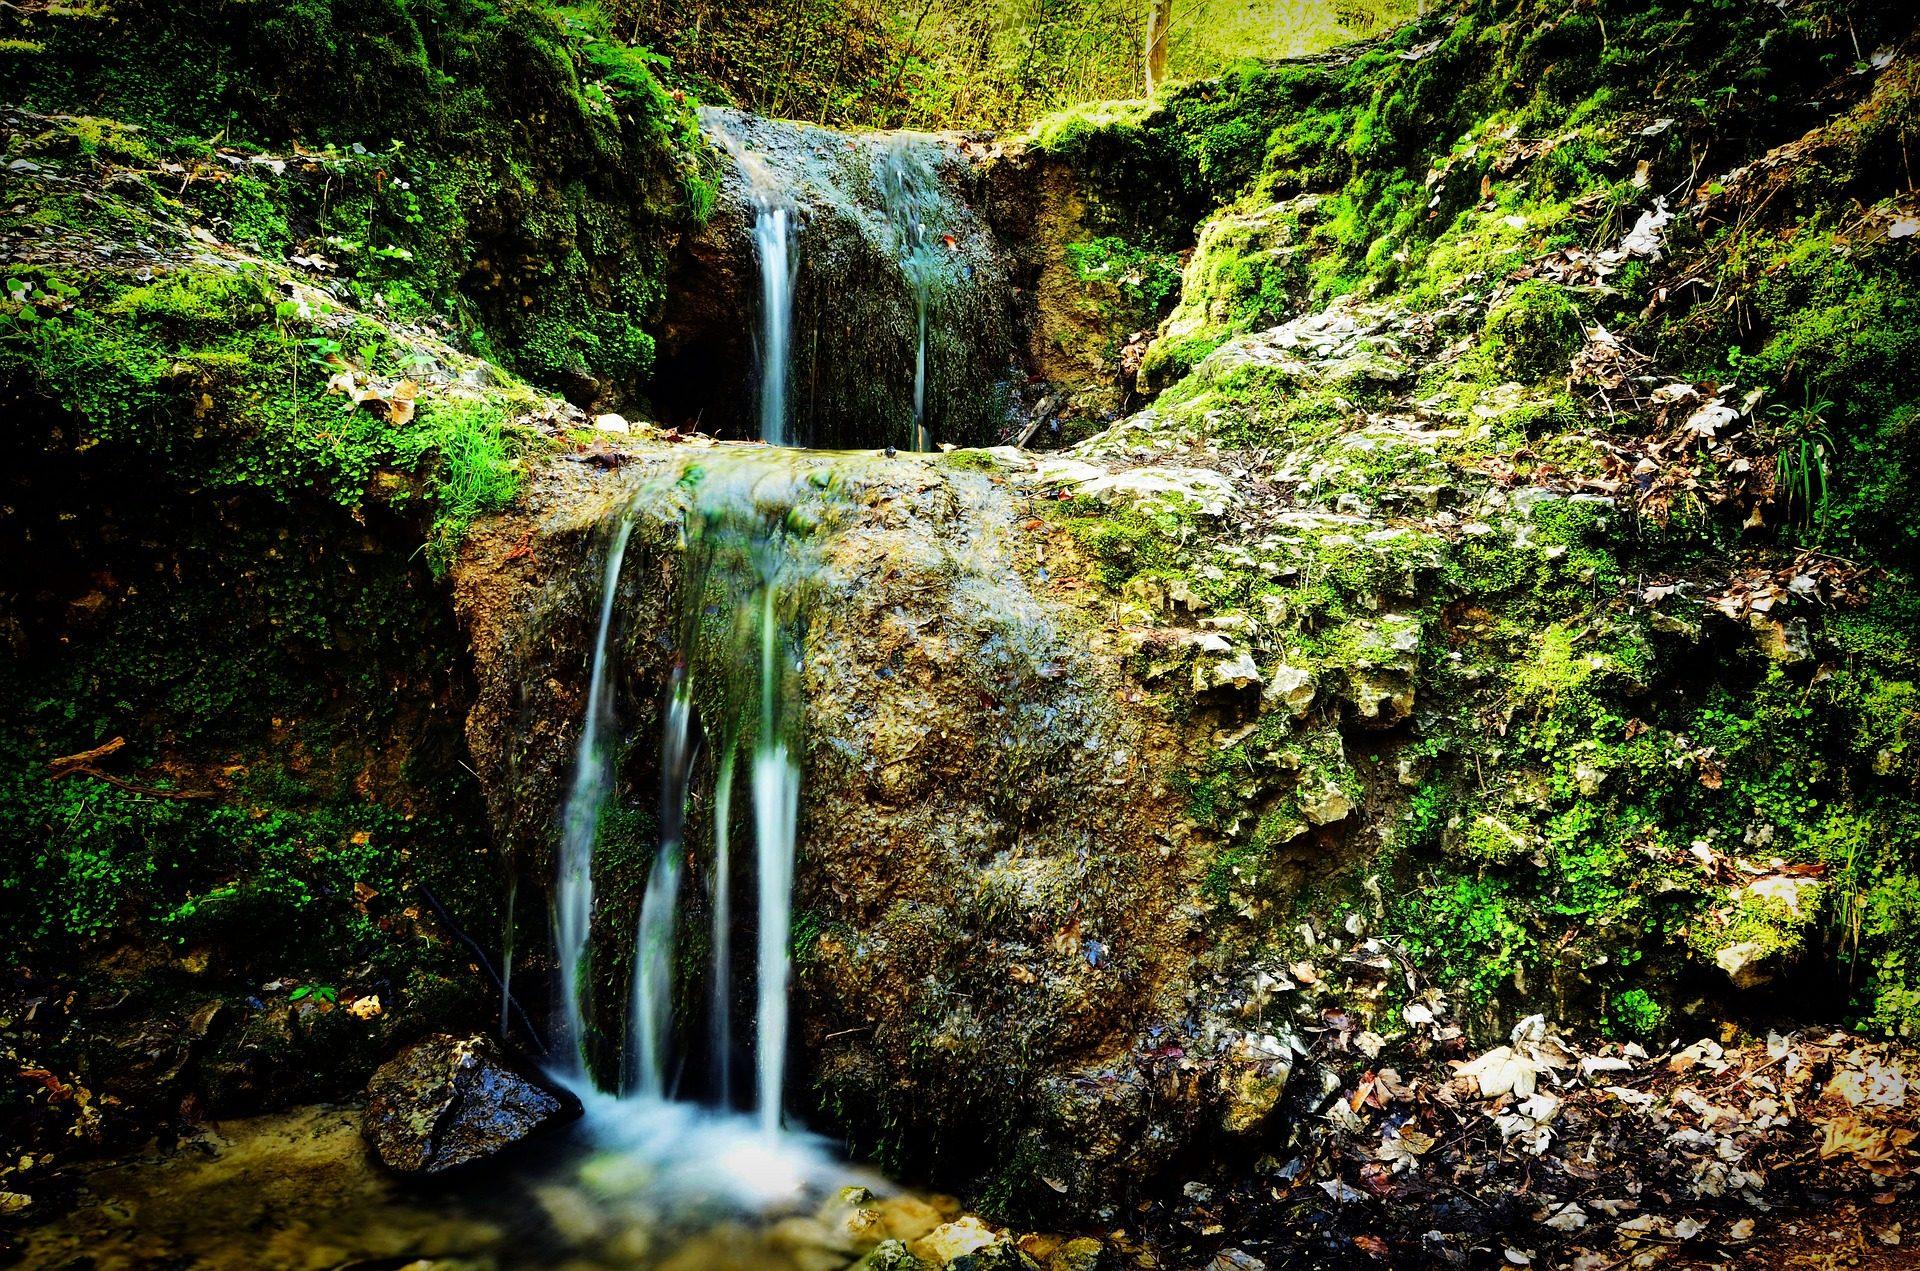 cai, Cachoeiras, floresta, água, umidade, vegetación - Papéis de parede HD - Professor-falken.com